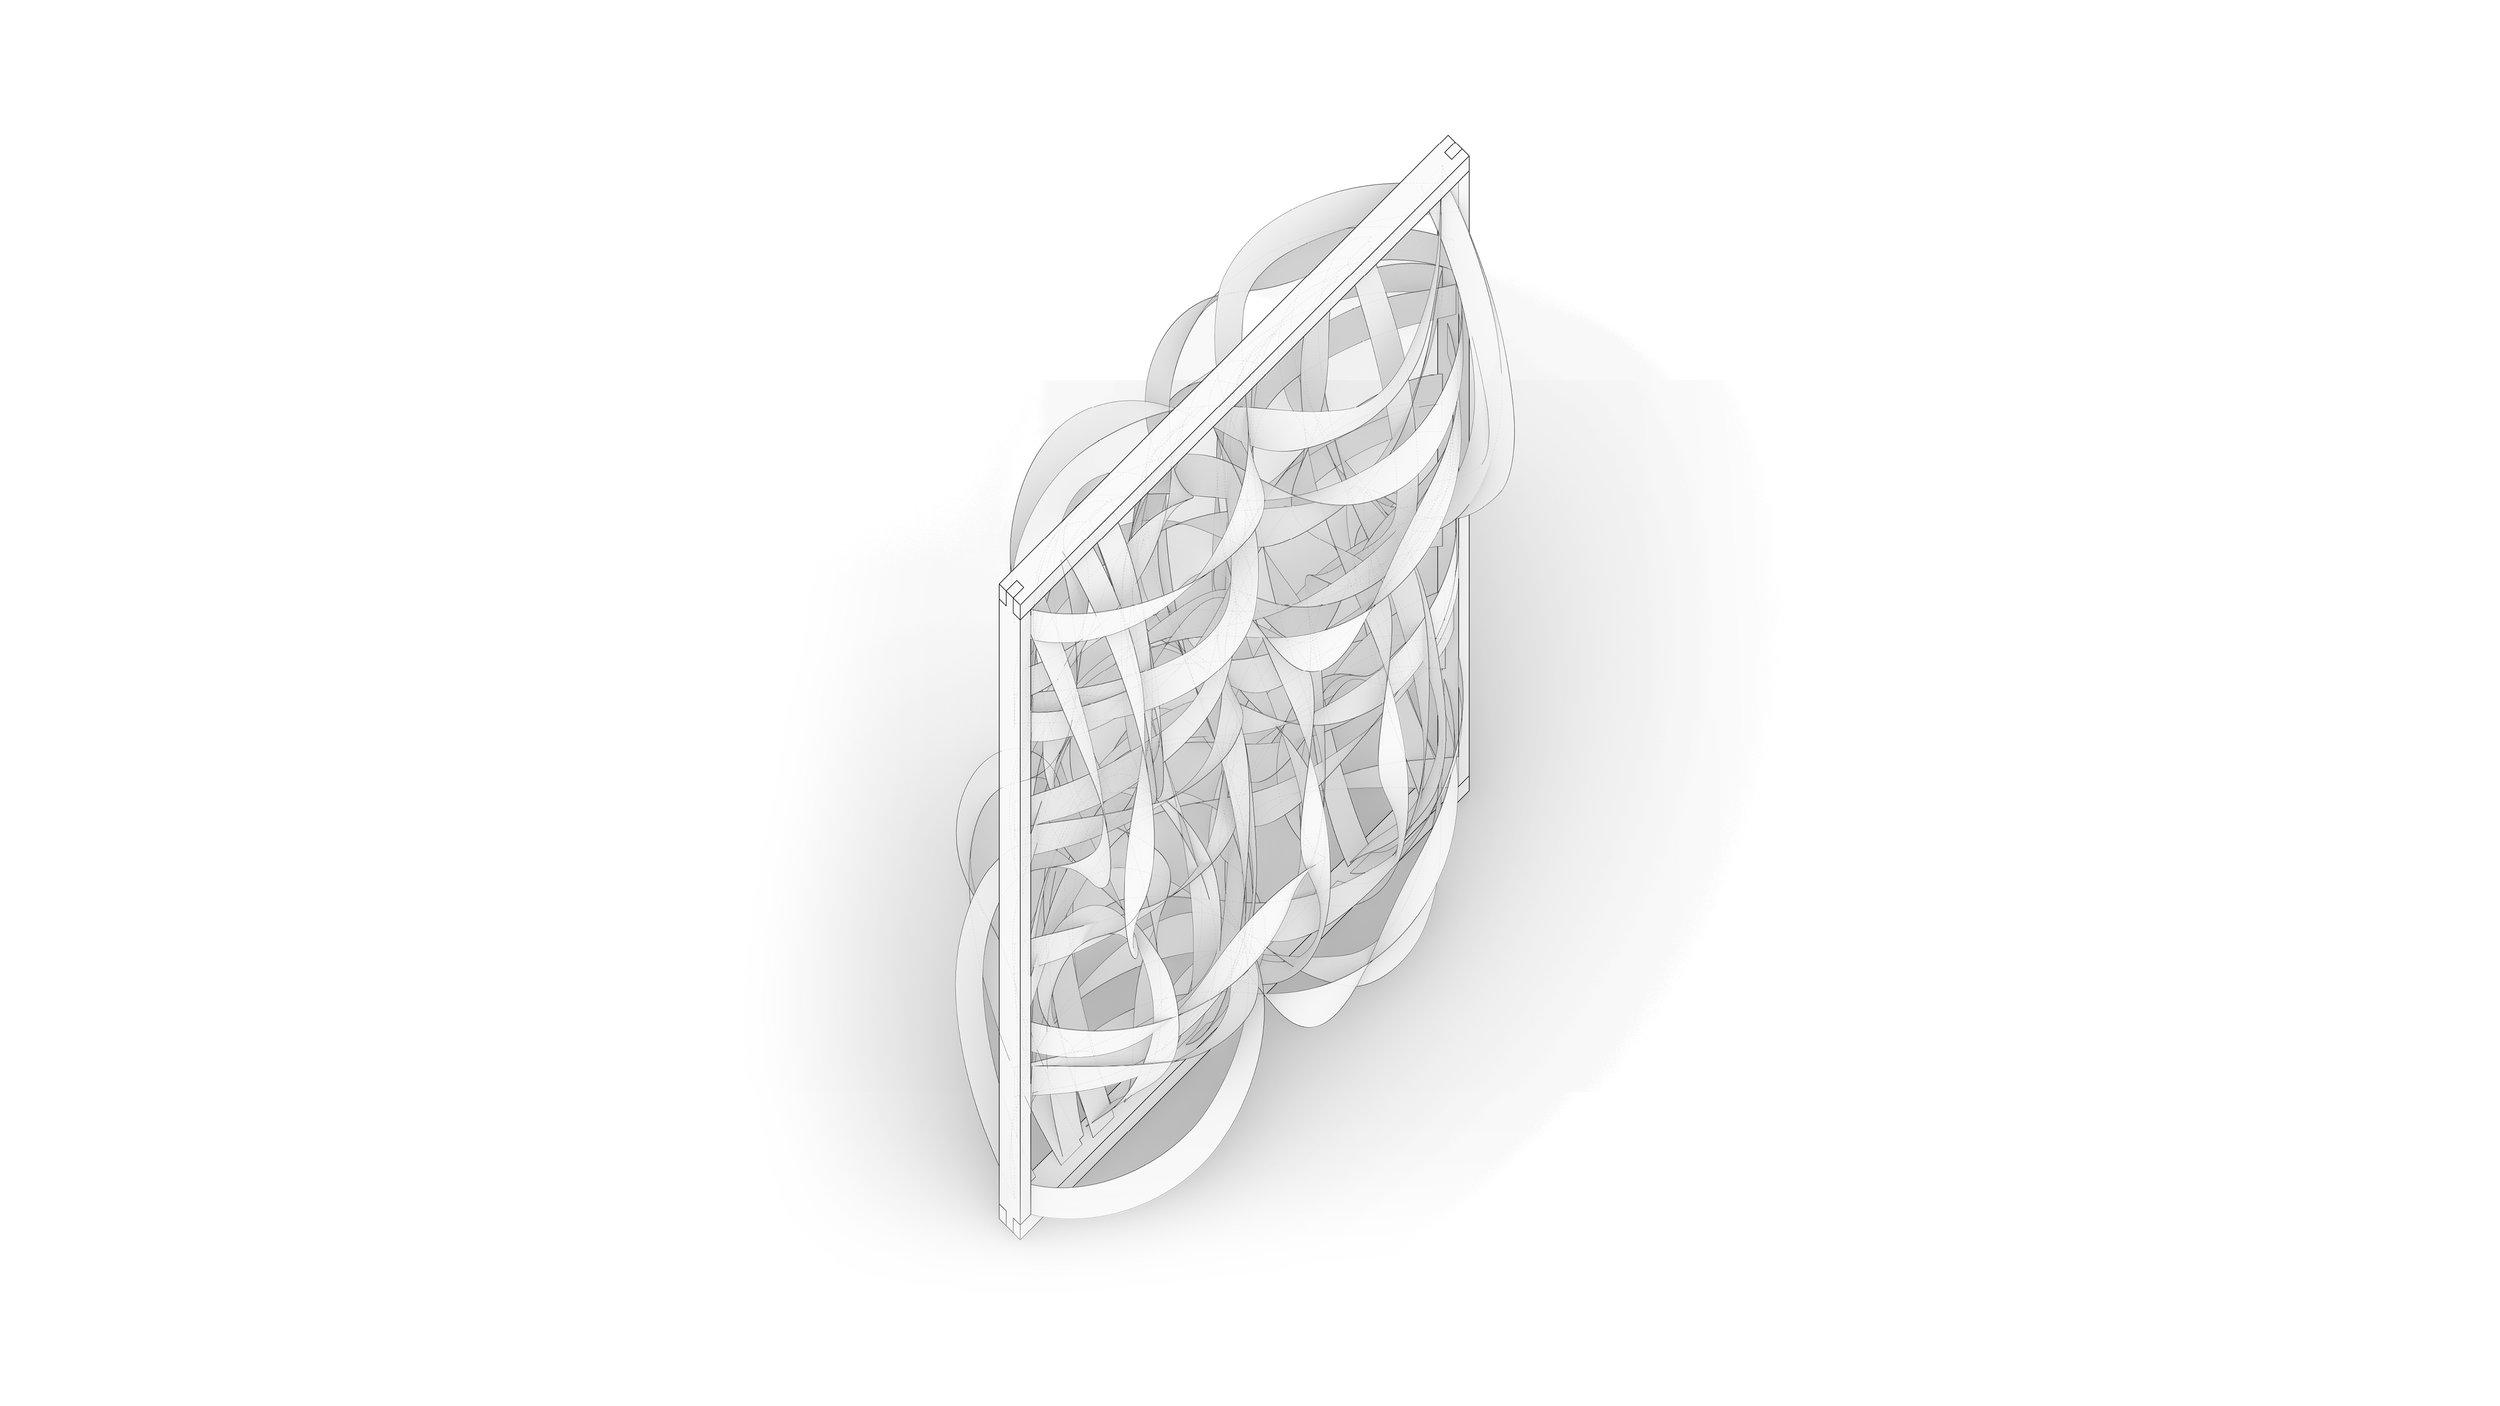 Design IV Fomrated6.jpg